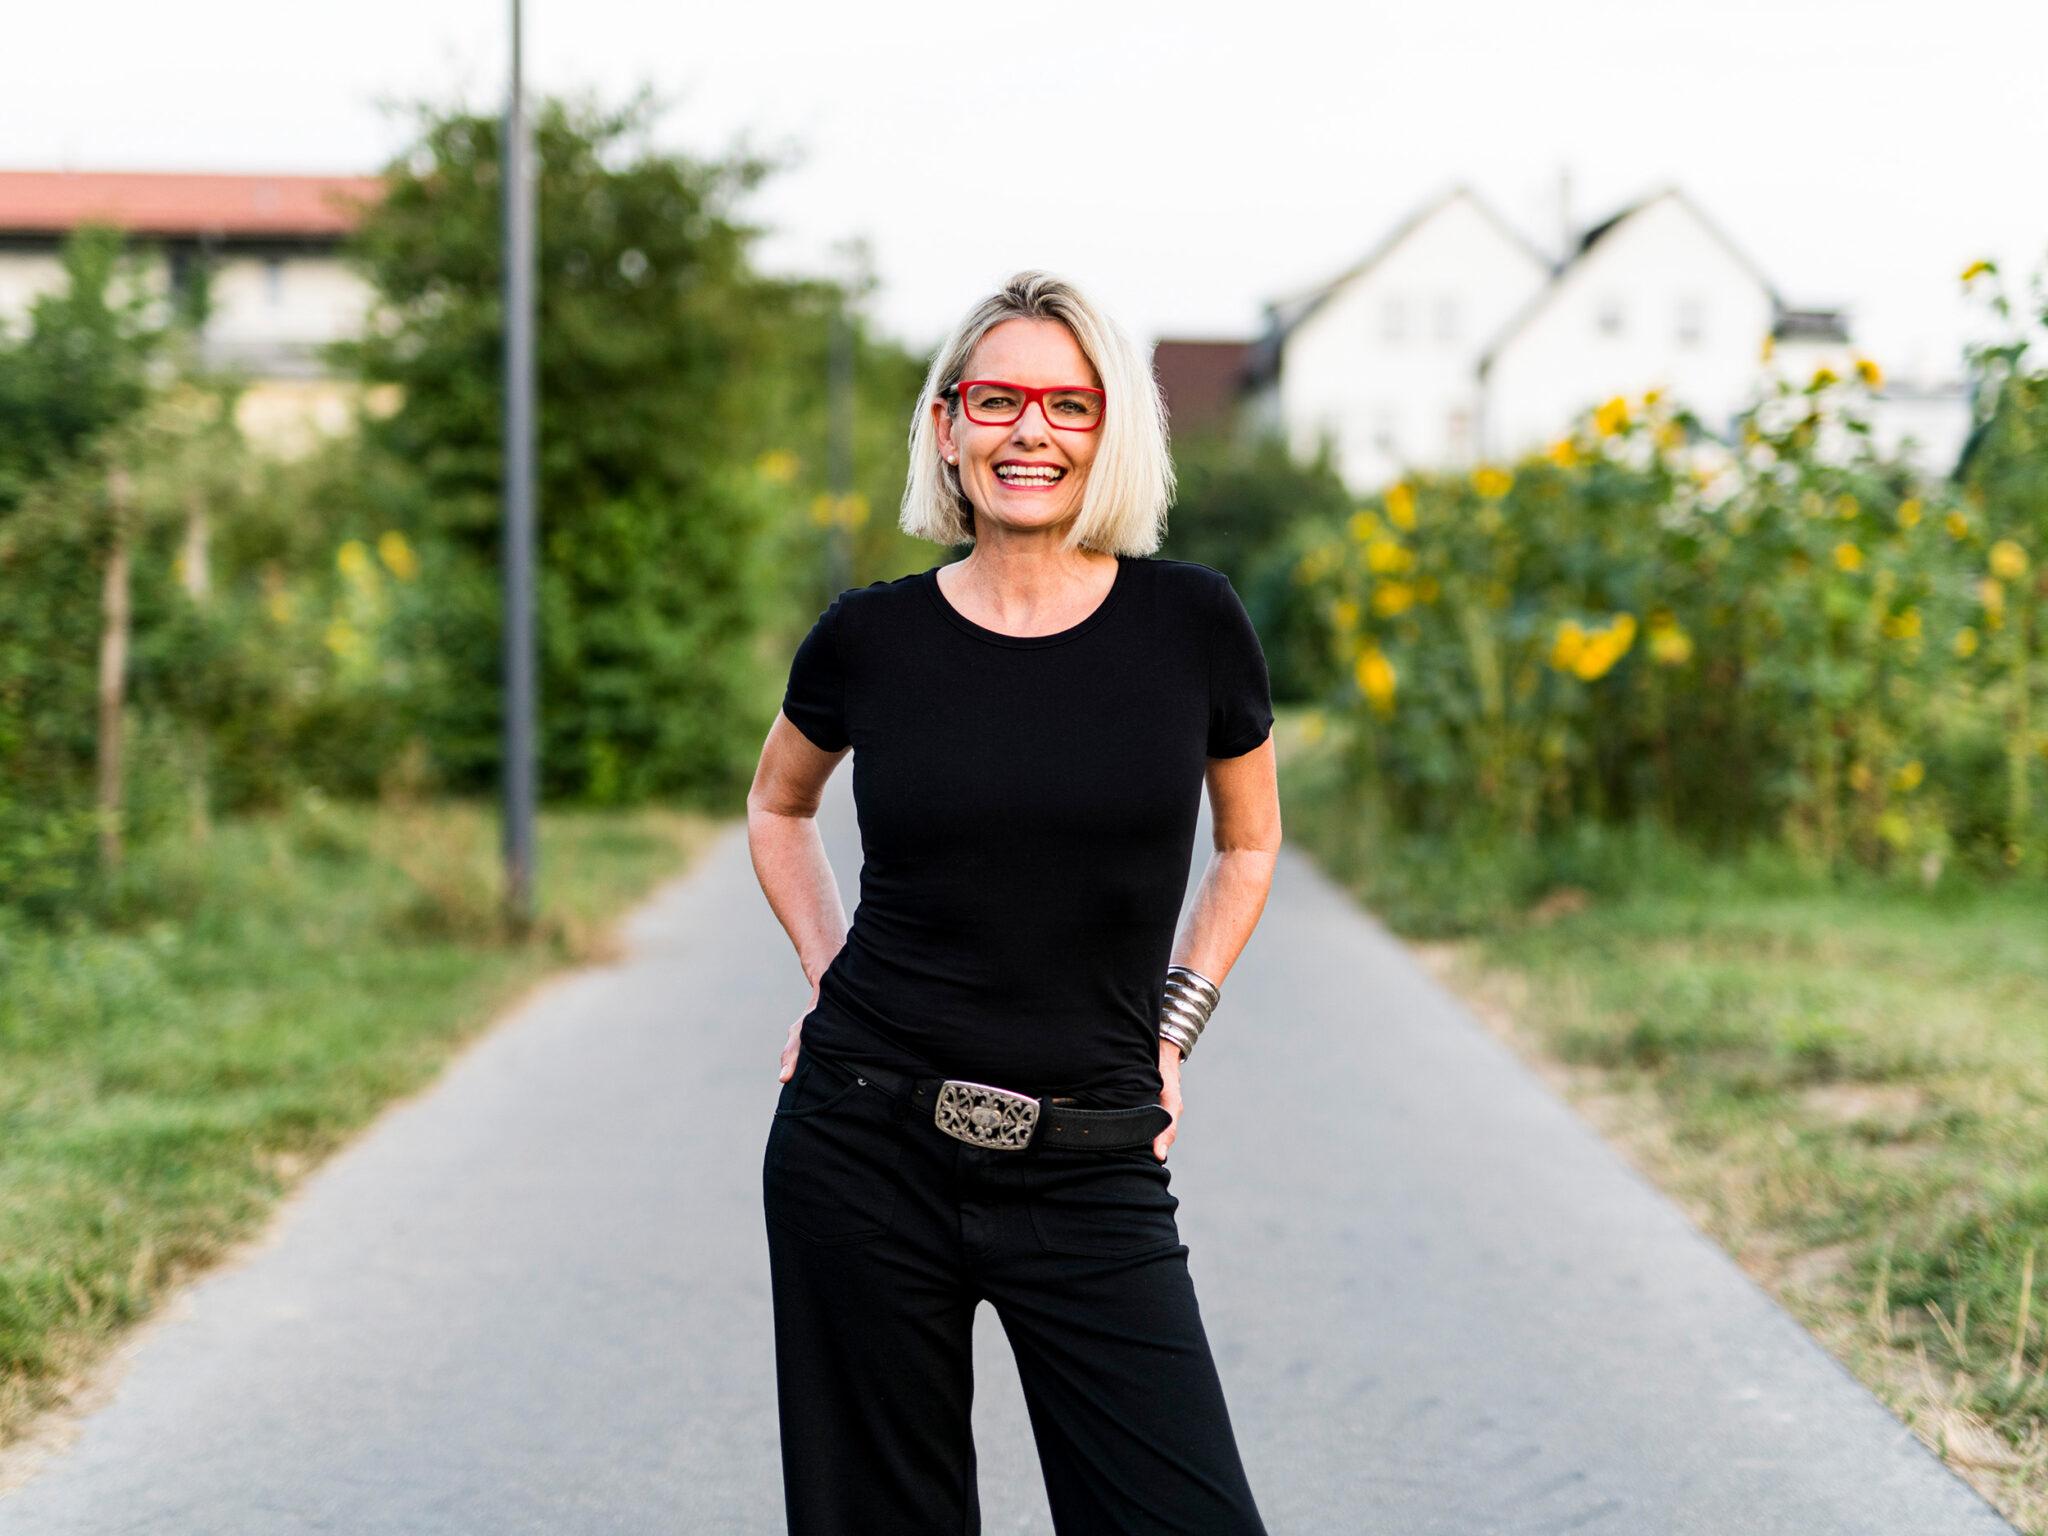 Elke Gregori (Bild: Sven Weber)